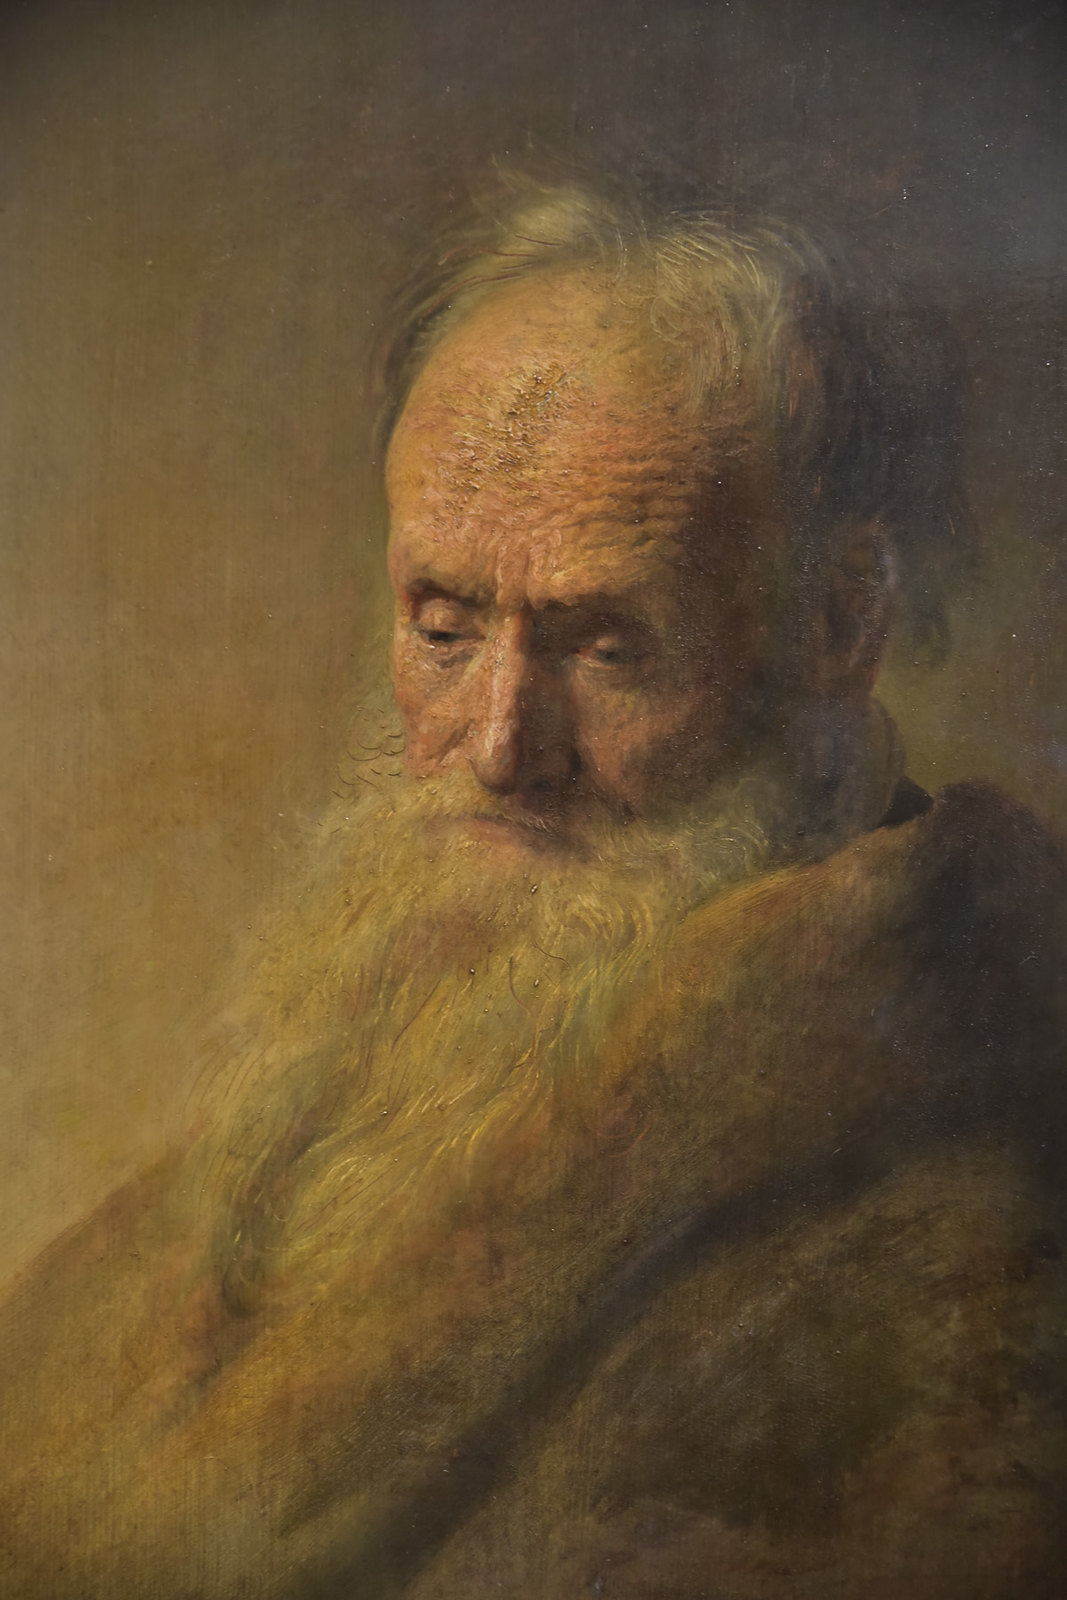 Rembrandt @ Národní galerie, Praha